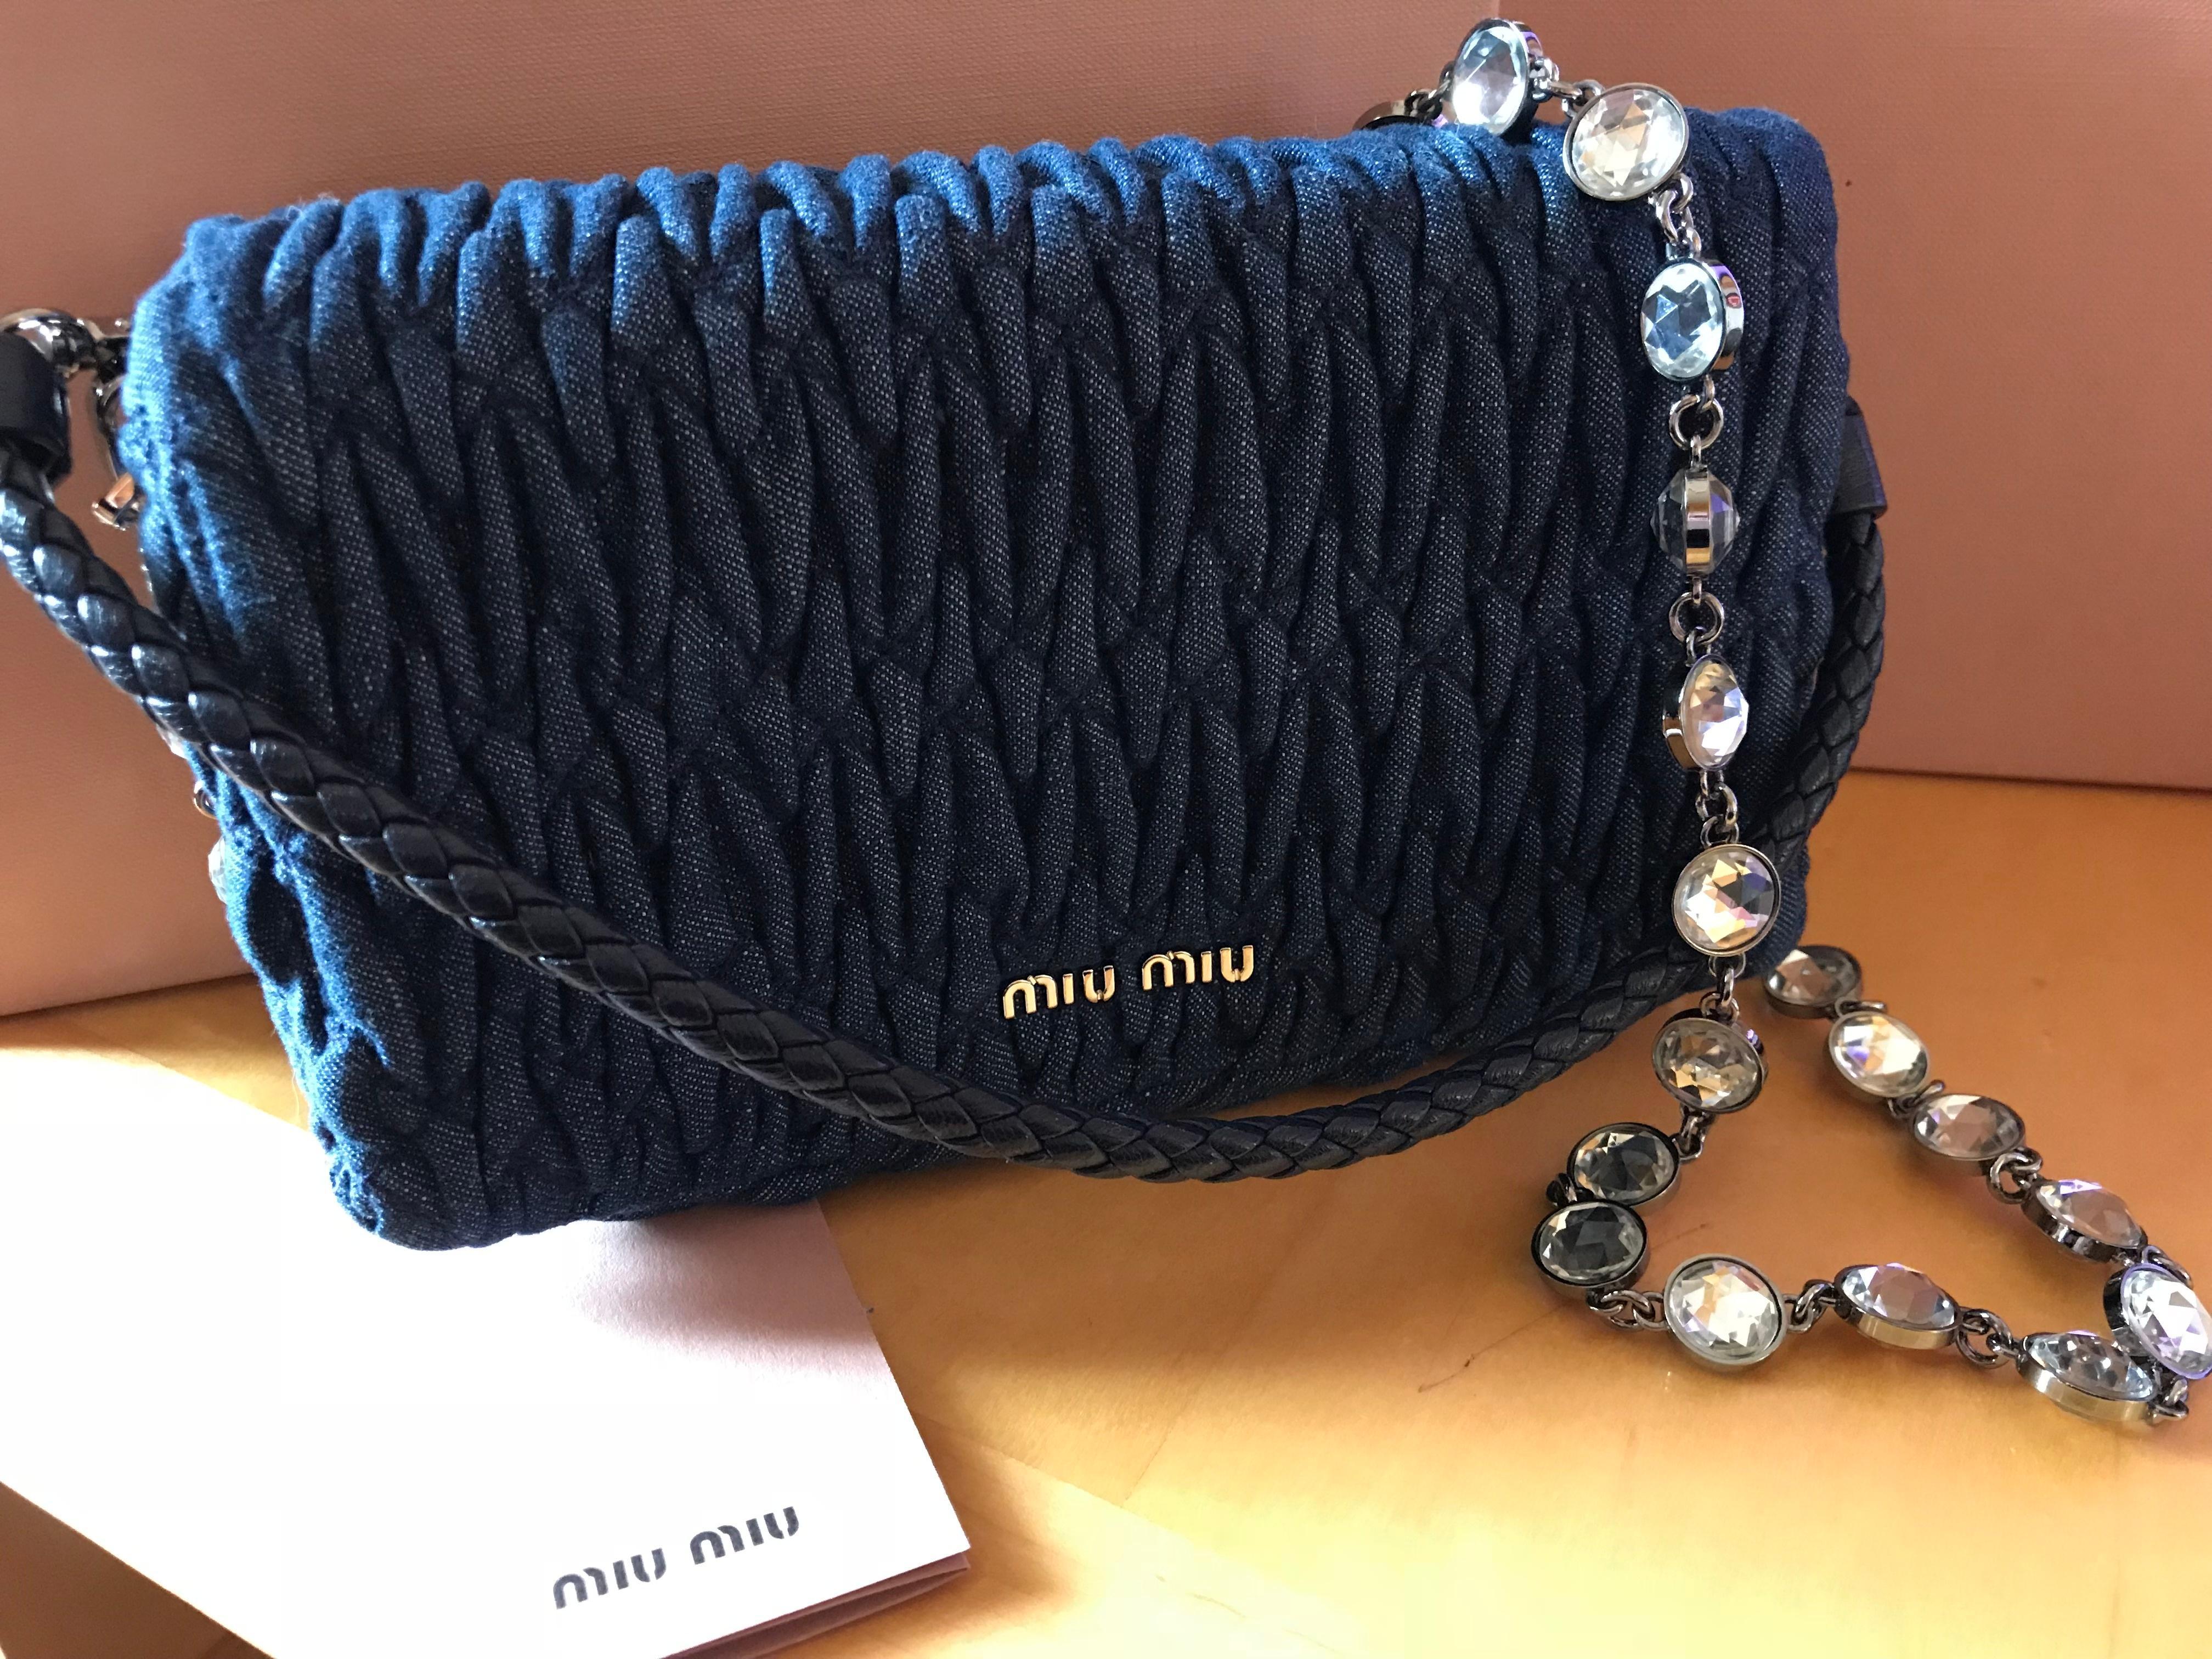 6b34ab3b43c1 ... Miu Miu Crystal Clutch Matelasse Denim Small - (Detachable Leather and Crystal  strap)